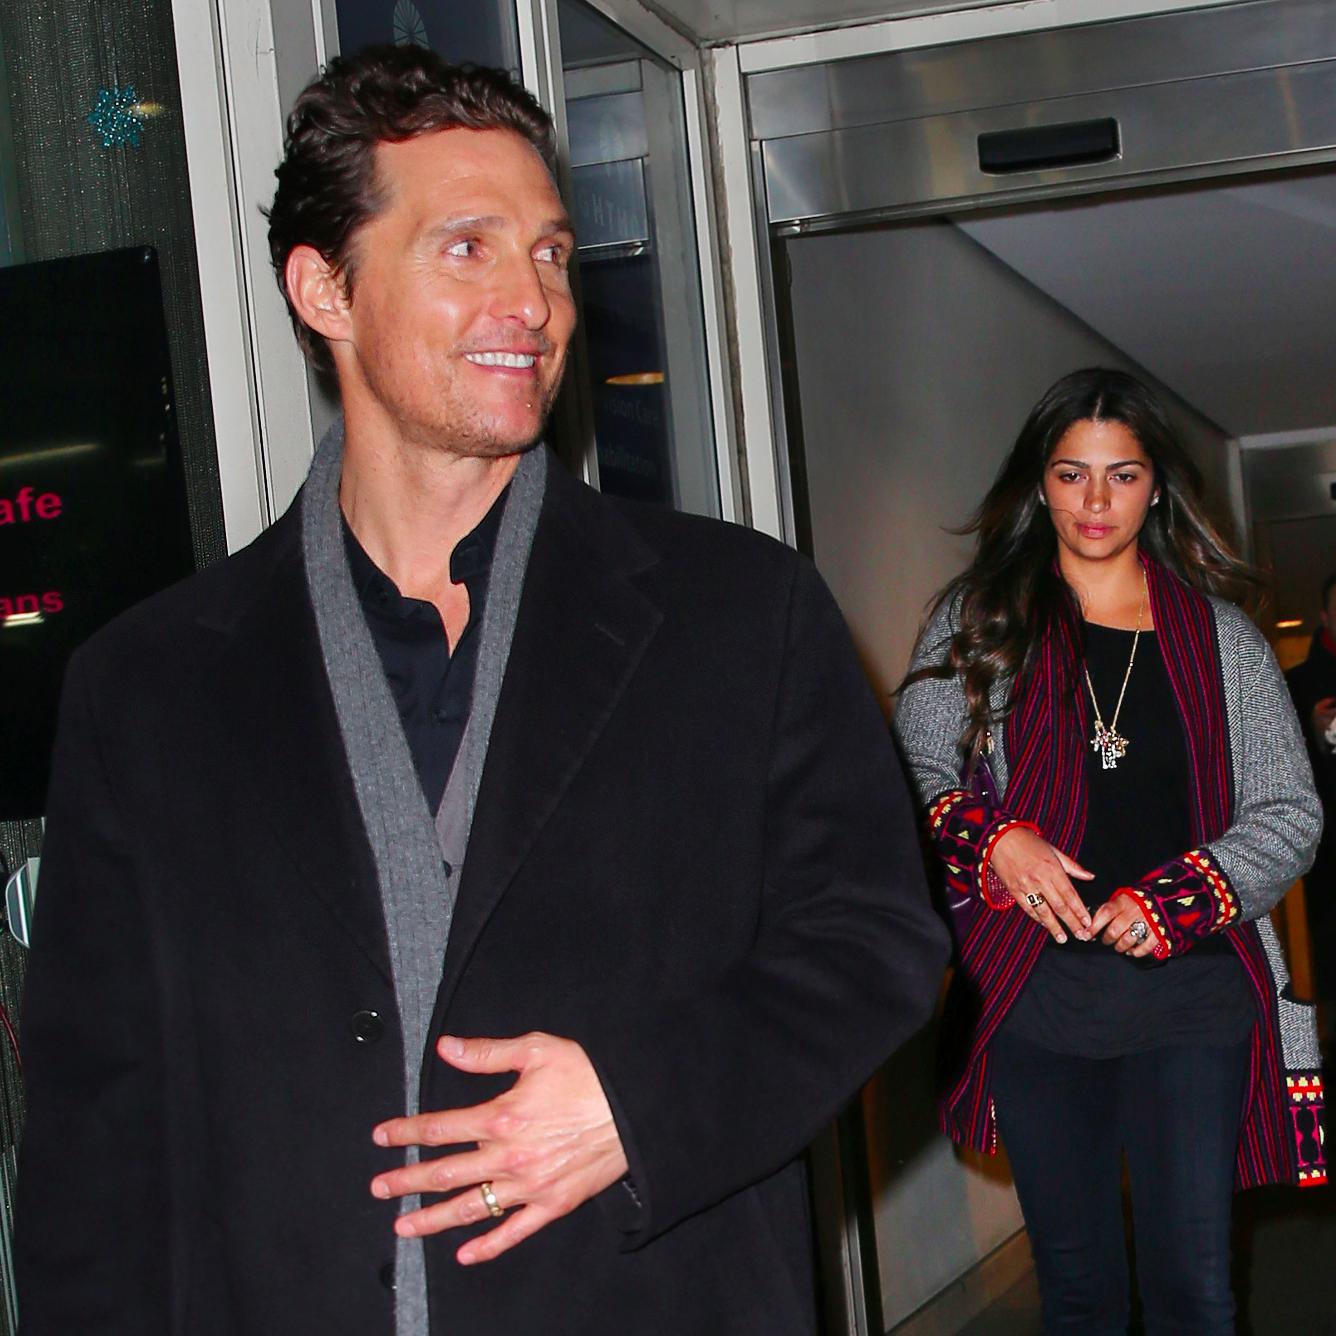 The Matthew McConaughey McConaissance Continues